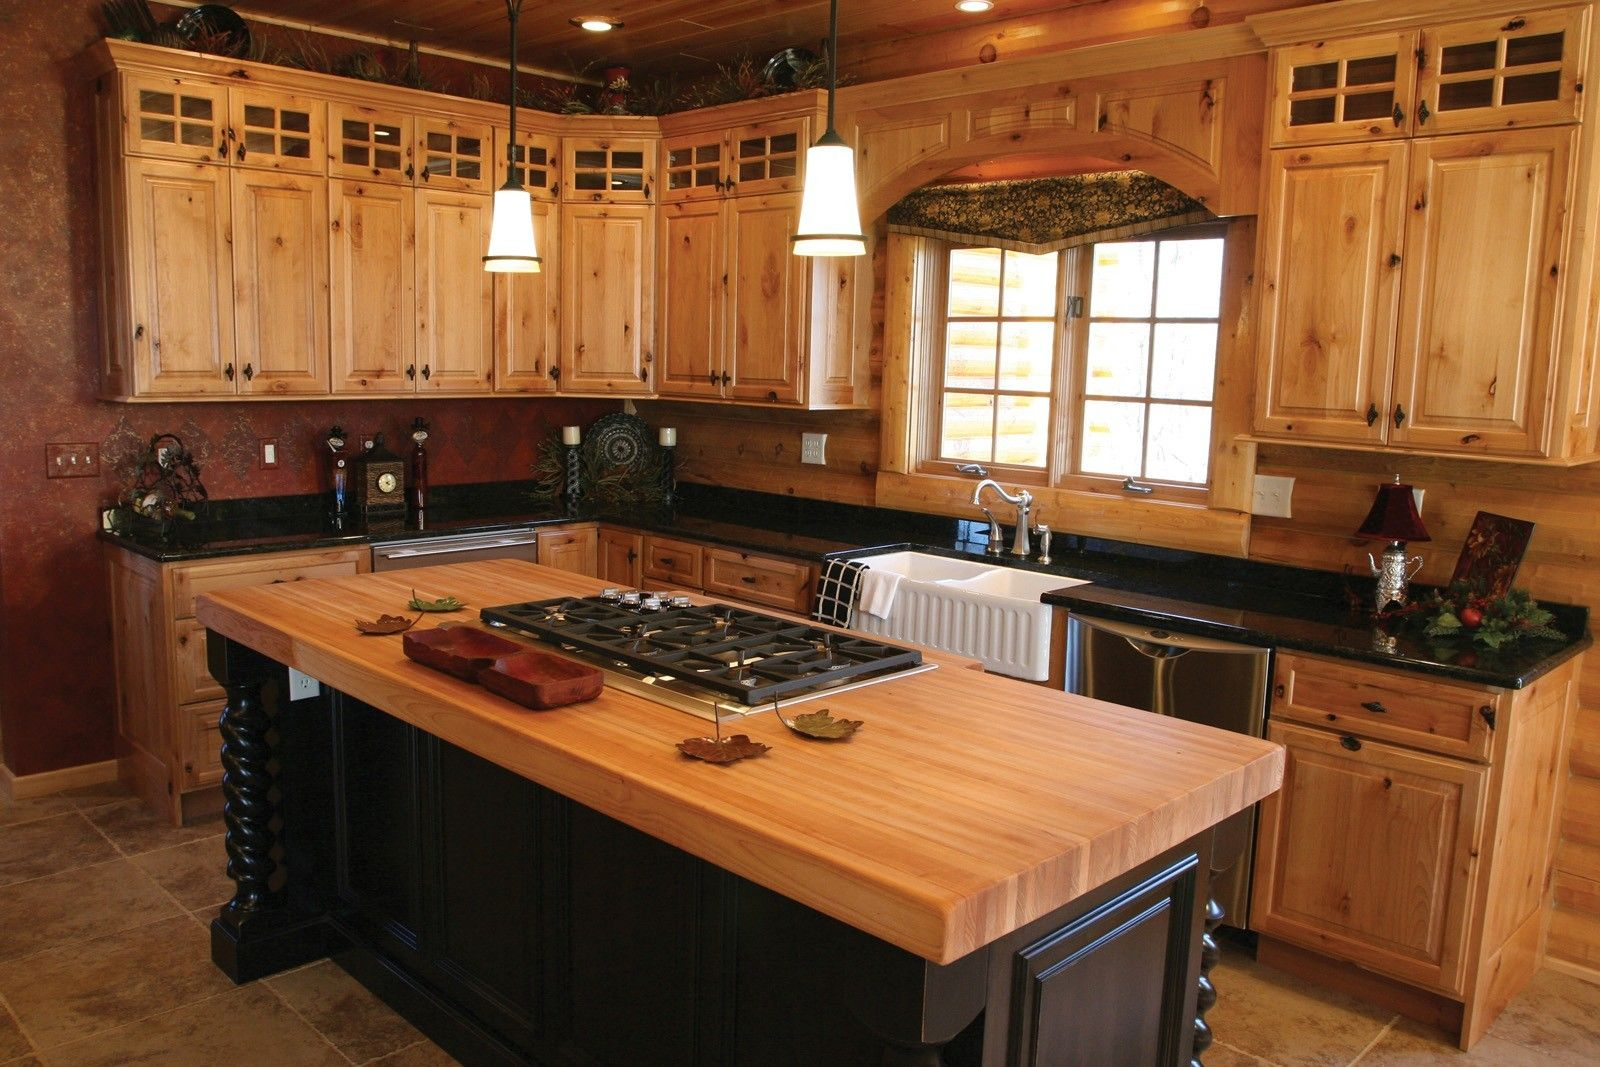 20 rustic hickory kitchen cabinets design ideas home log home rh pinterest com